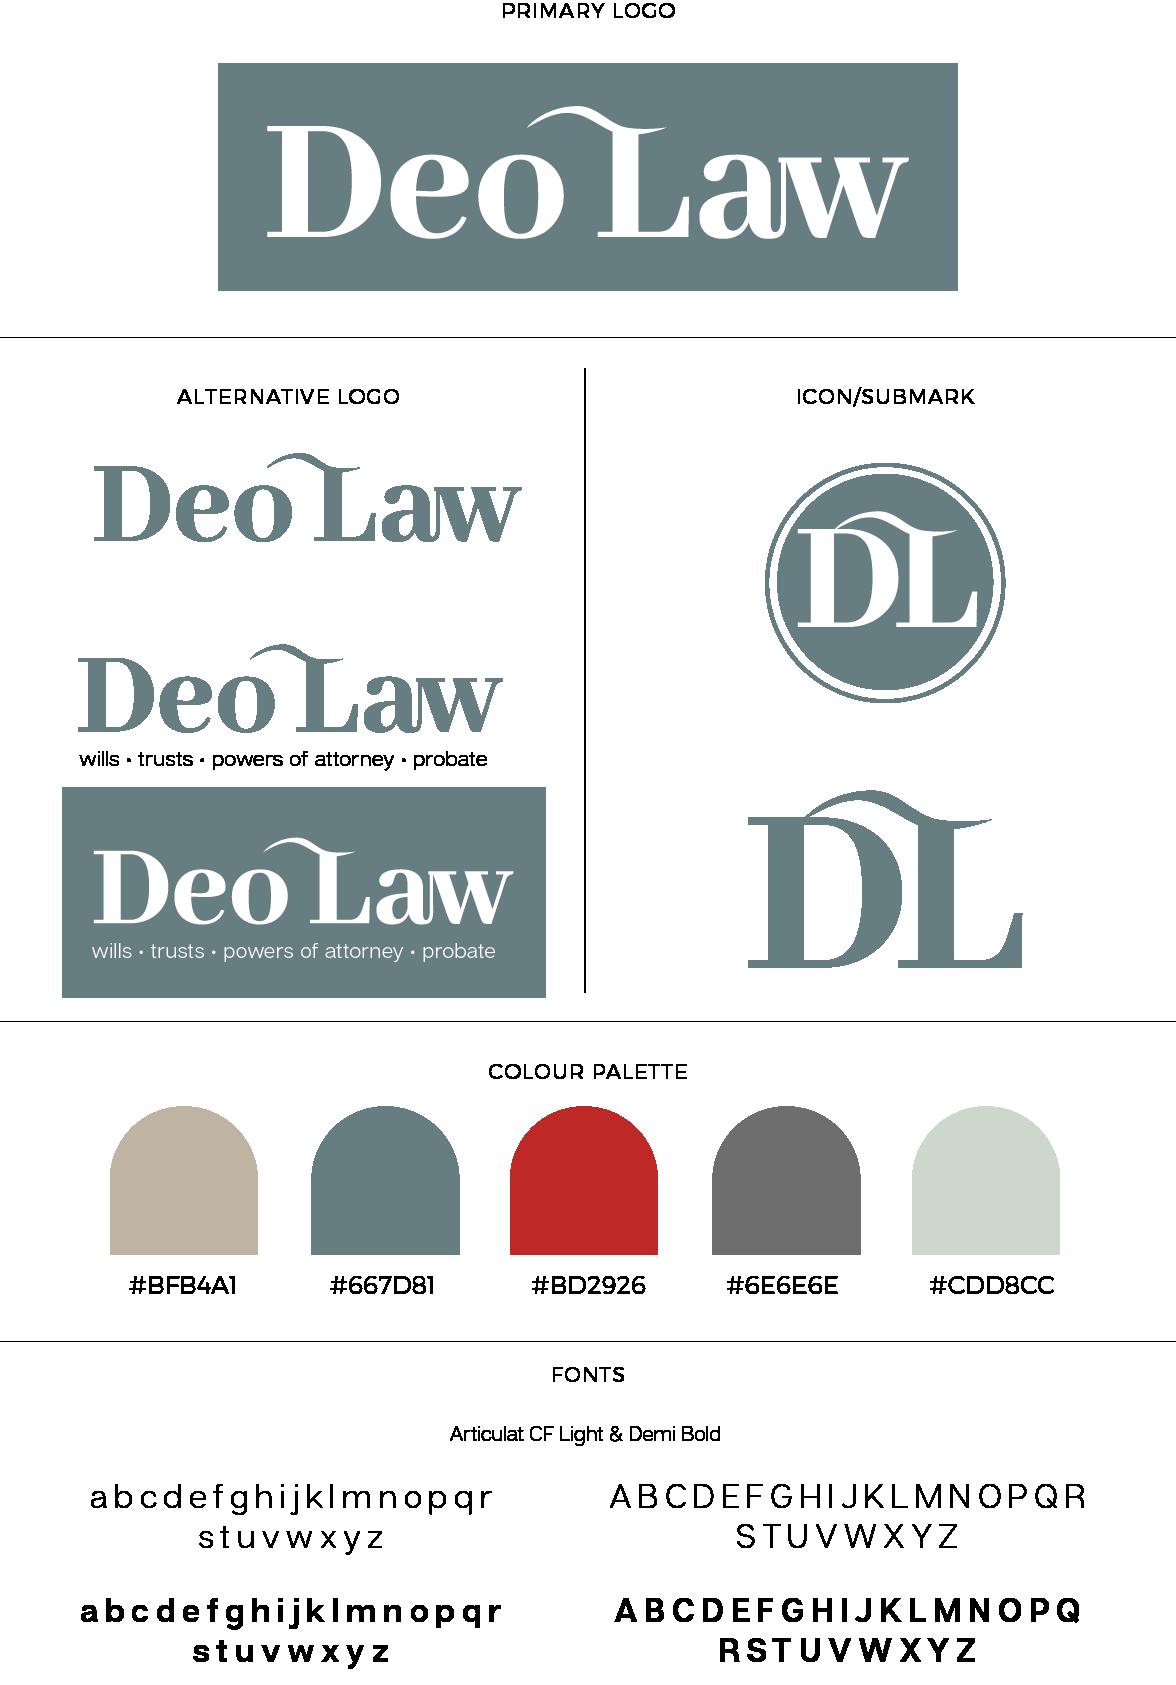 Deo Law Brand Board